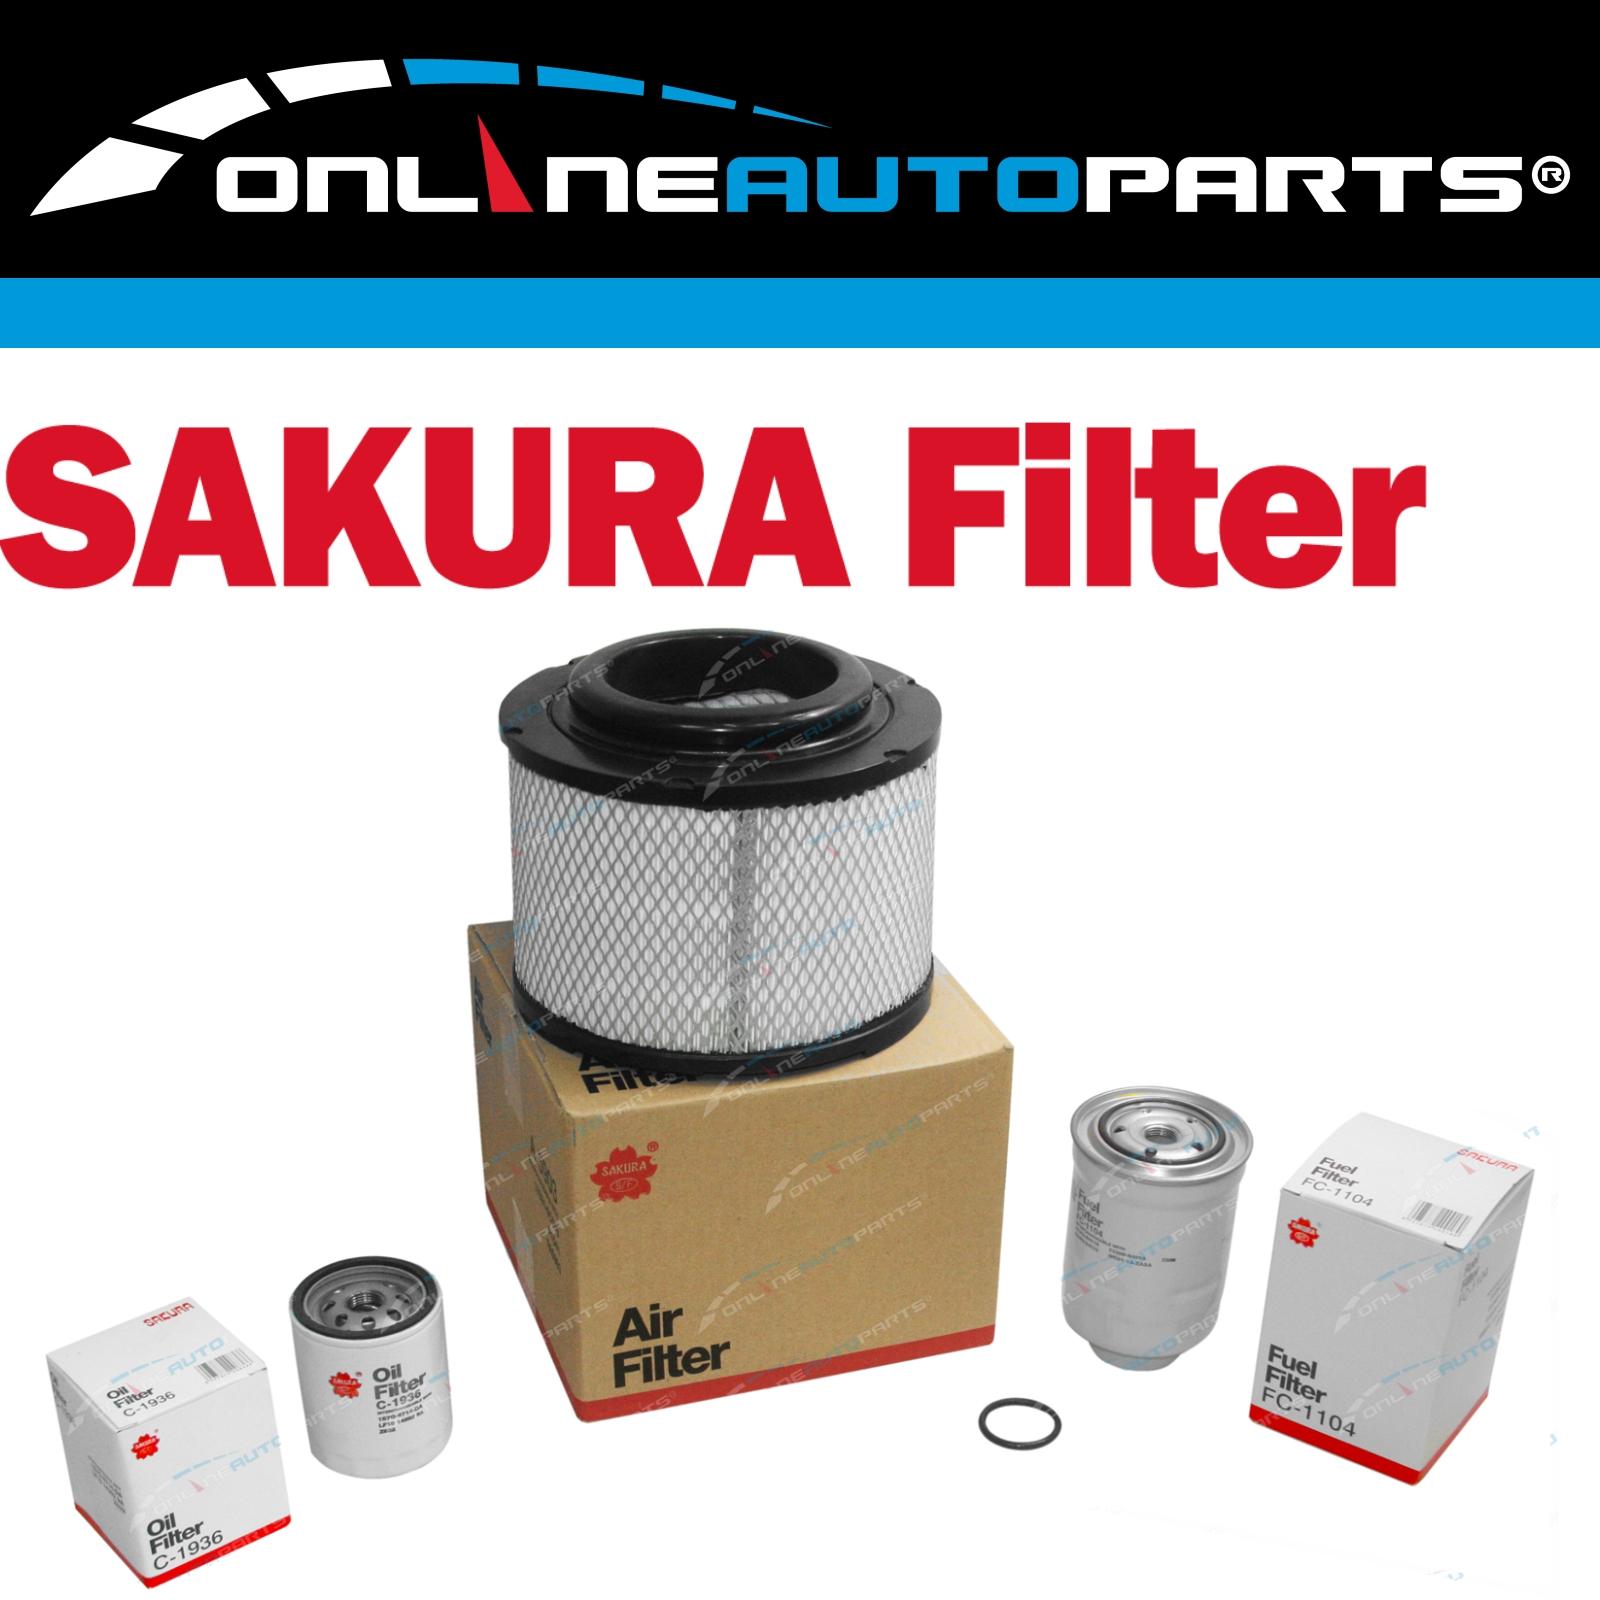 medium resolution of details about oil air fuel filter kit fit ranger pj pk 4cyl 2 5l wlat 3 0l weat 2006 2011